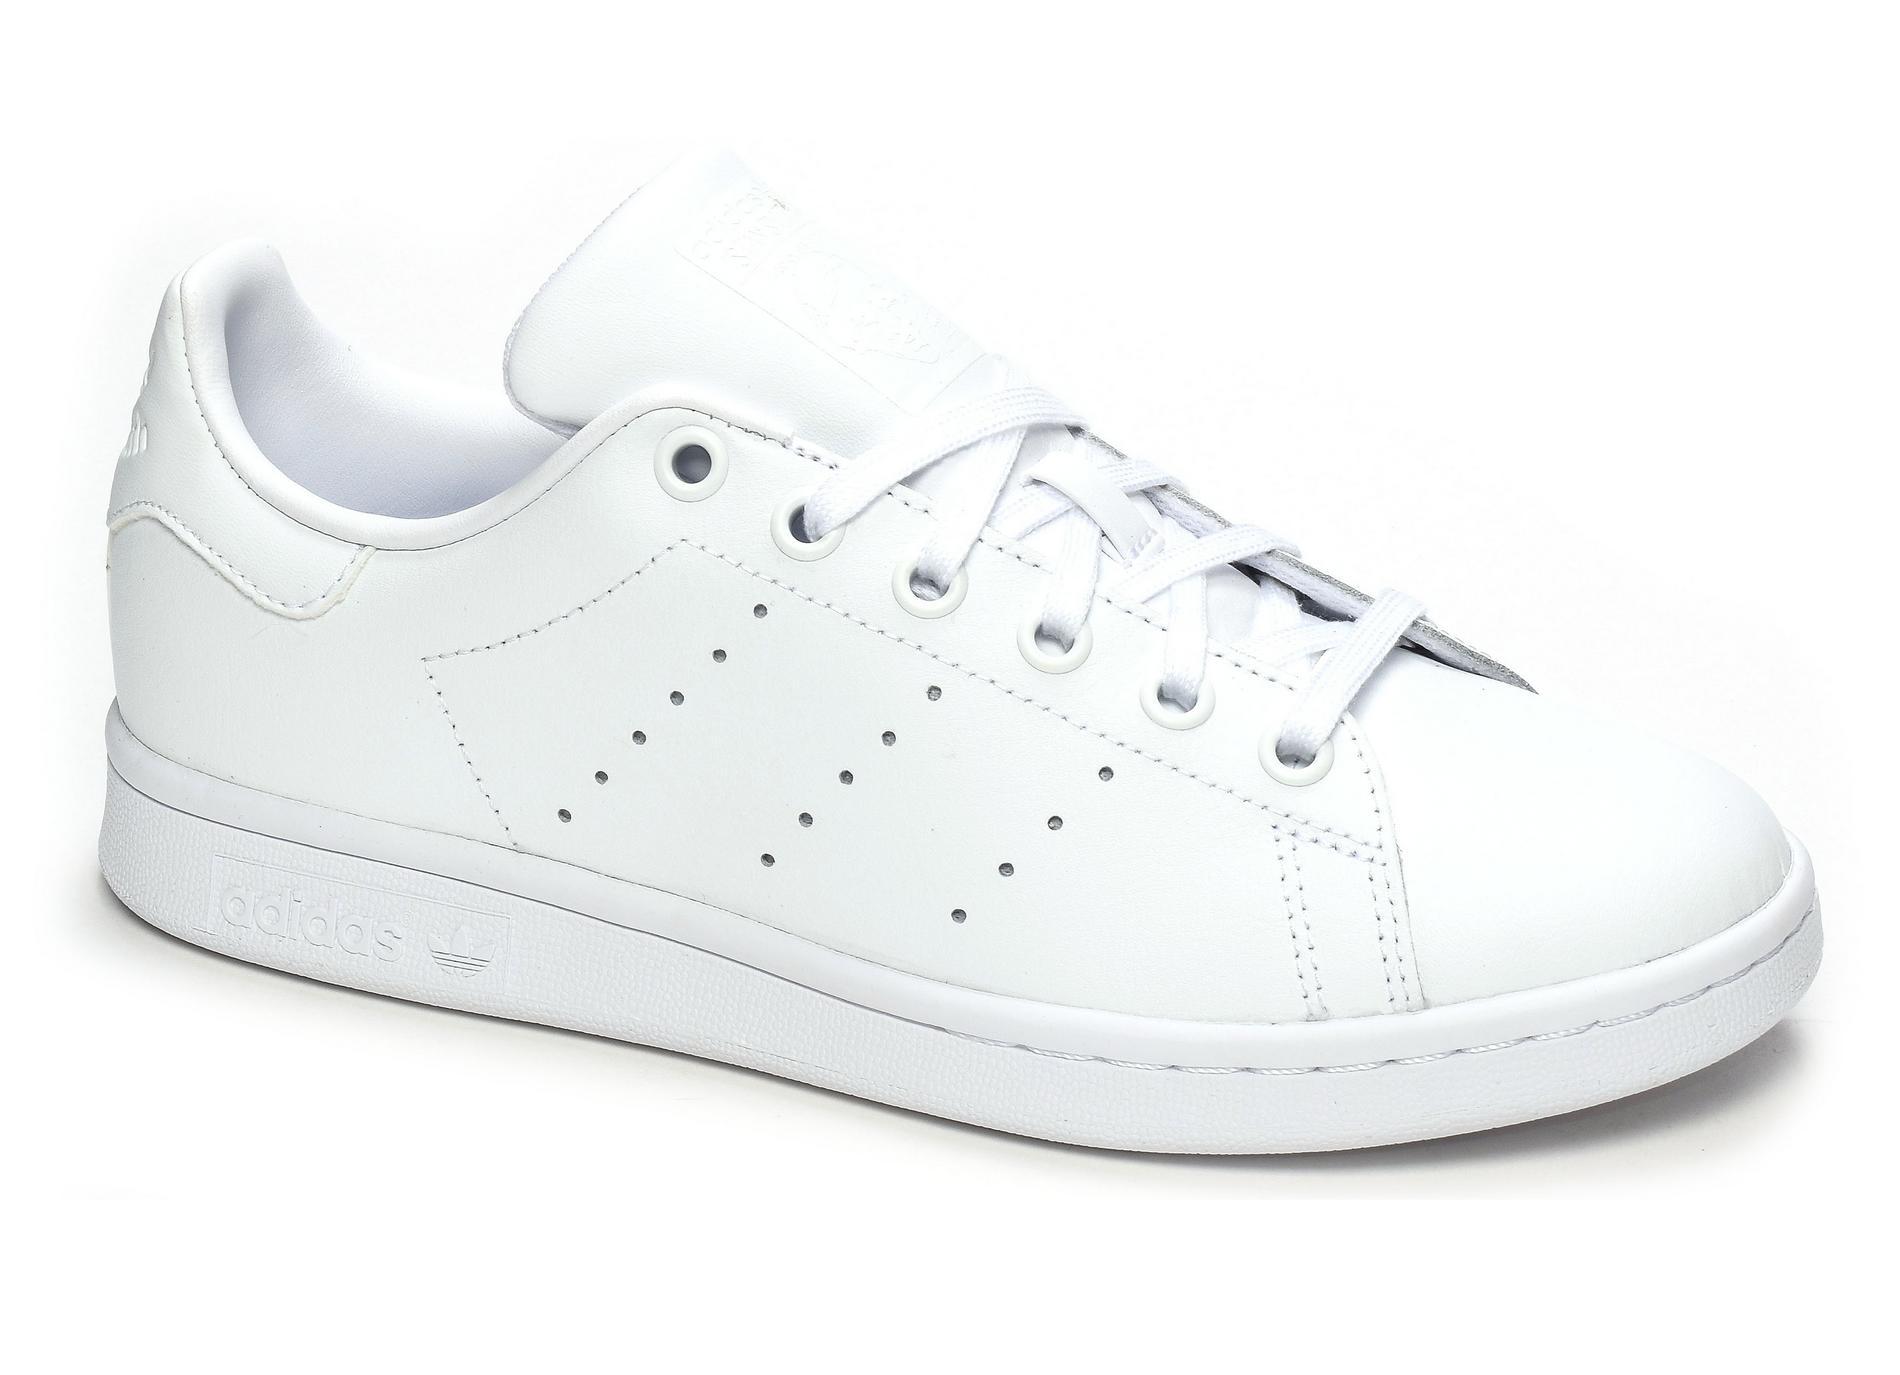 baskets Adidas Stan smith ortholite